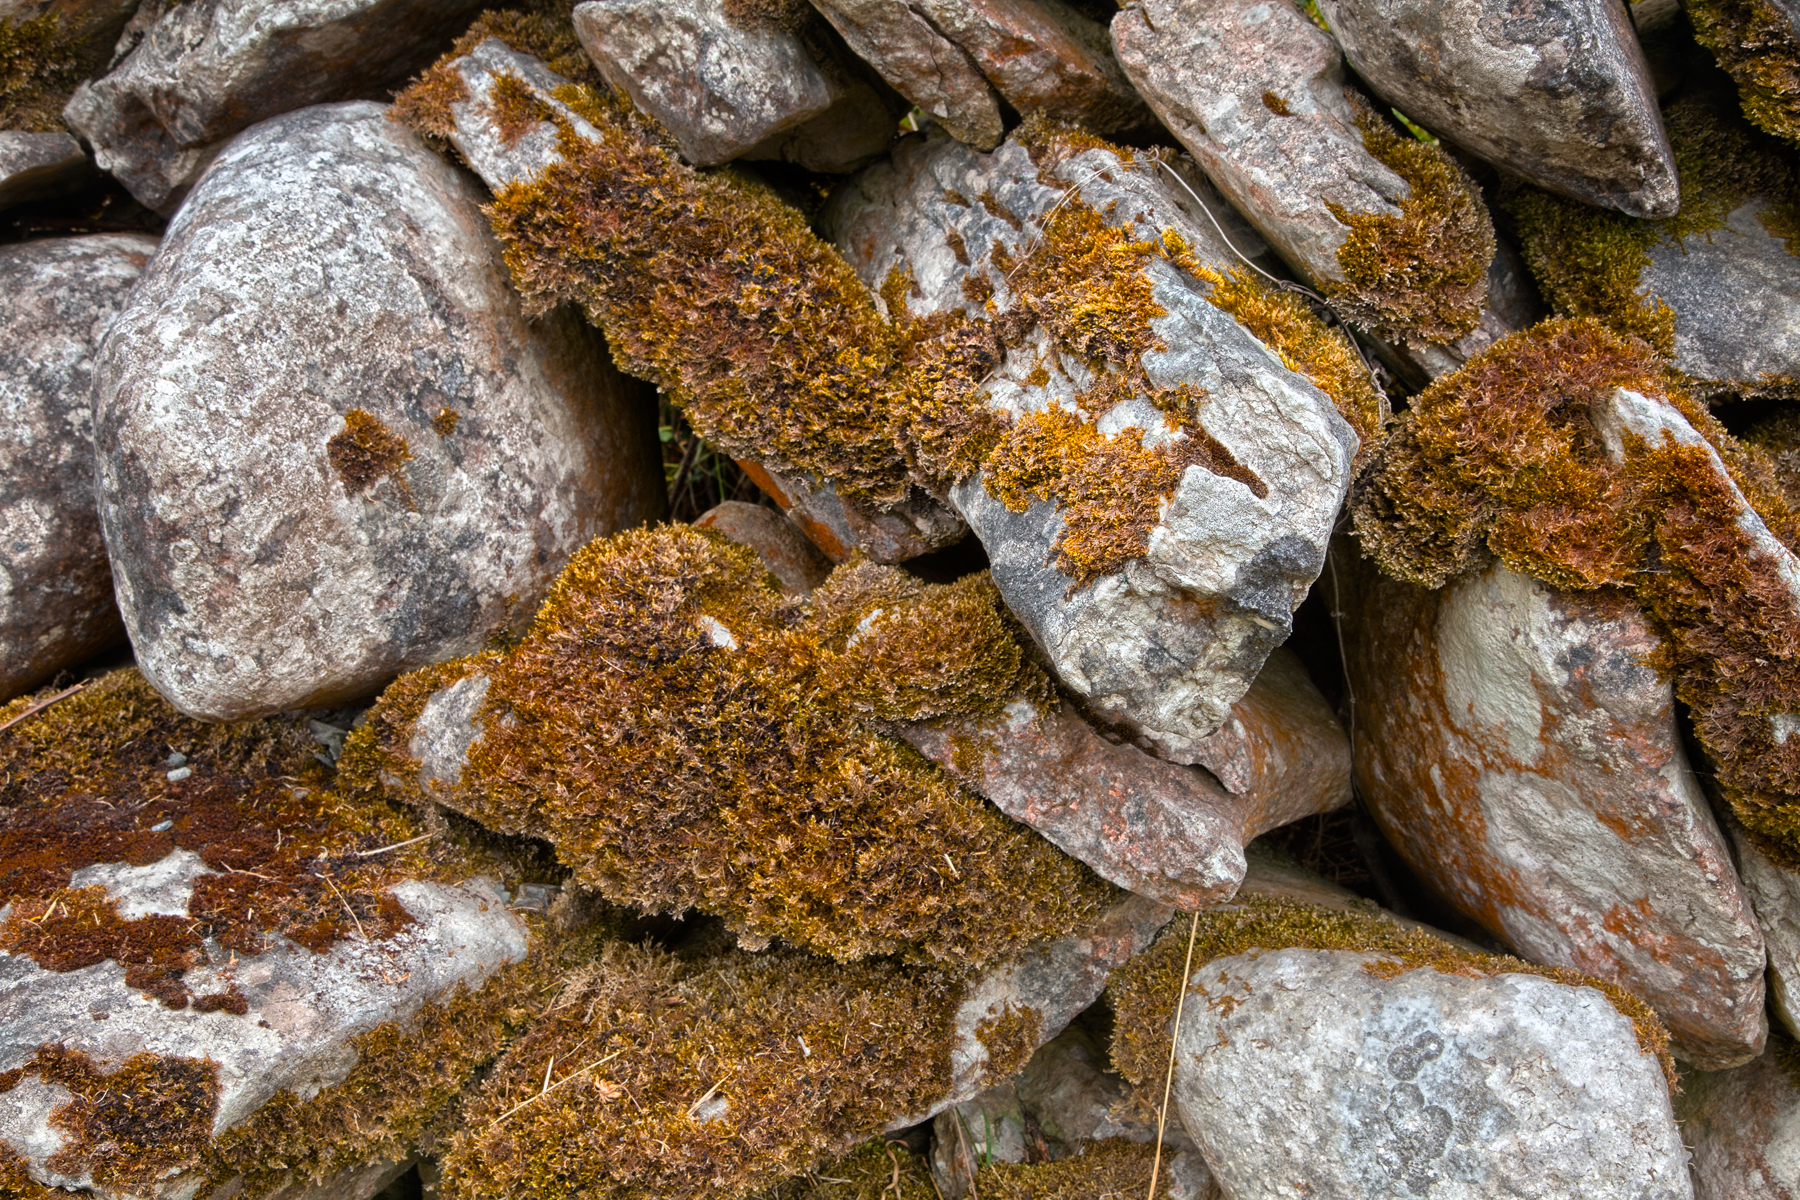 Mossy Rocks Texture, Backdrop, Shapes, Photo, Photograph, HQ Photo